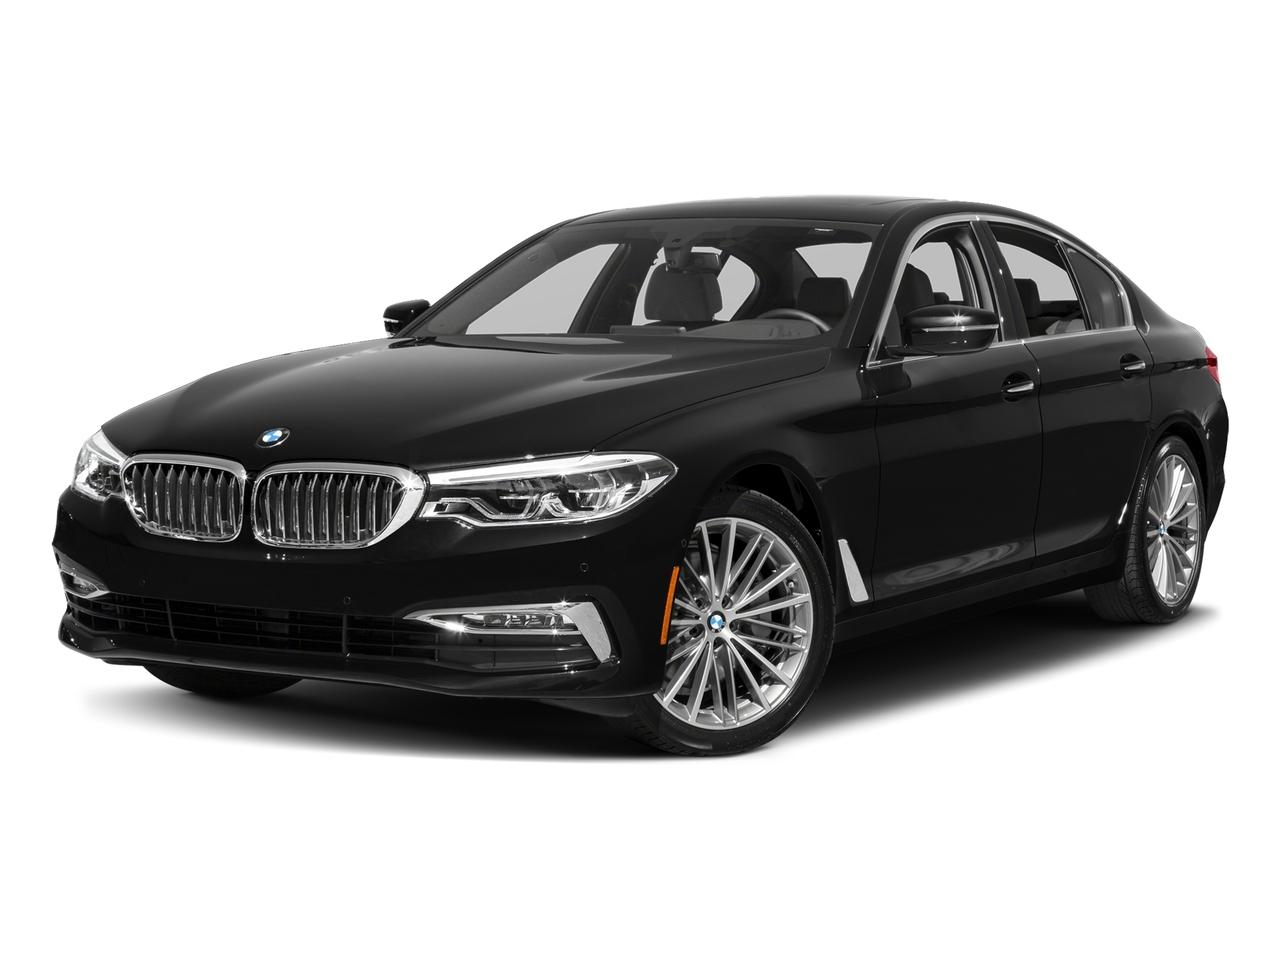 2017 BMW 540i Vehicle Photo in Pleasanton, CA 94588